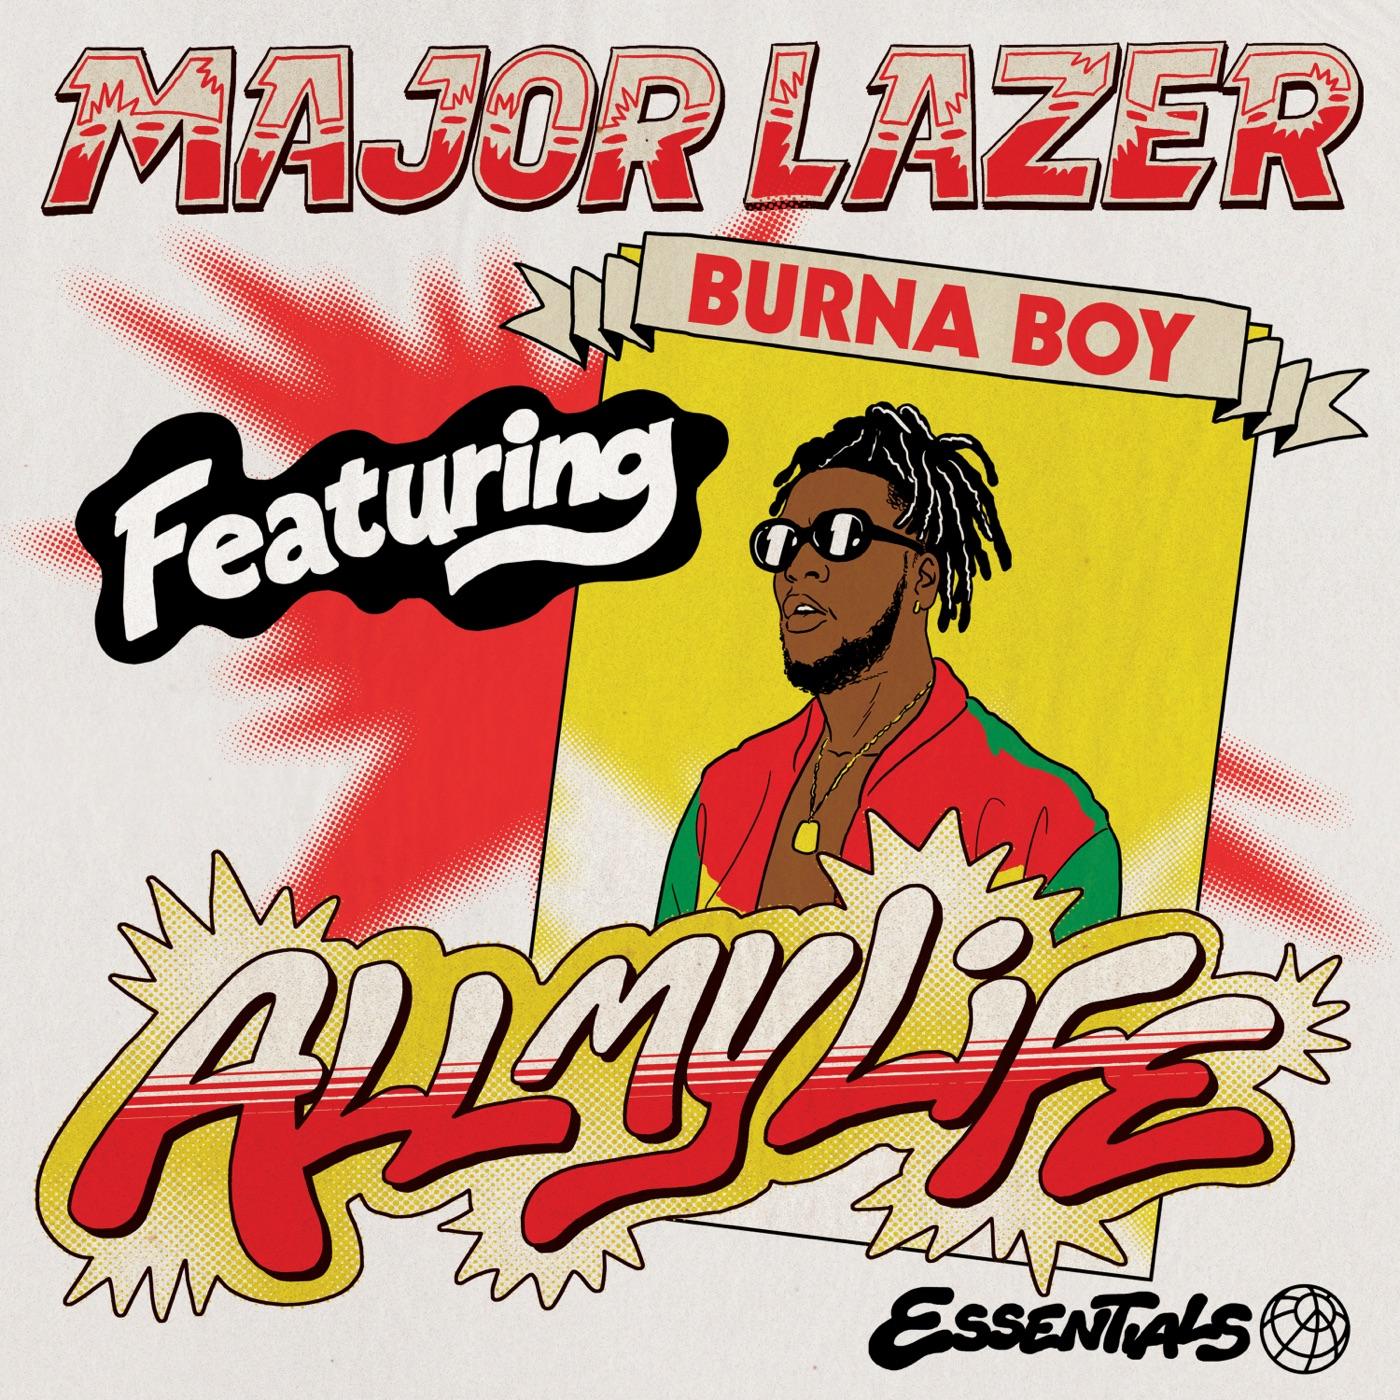 Download Major Lazer All My Life Feat Burna Boy Single